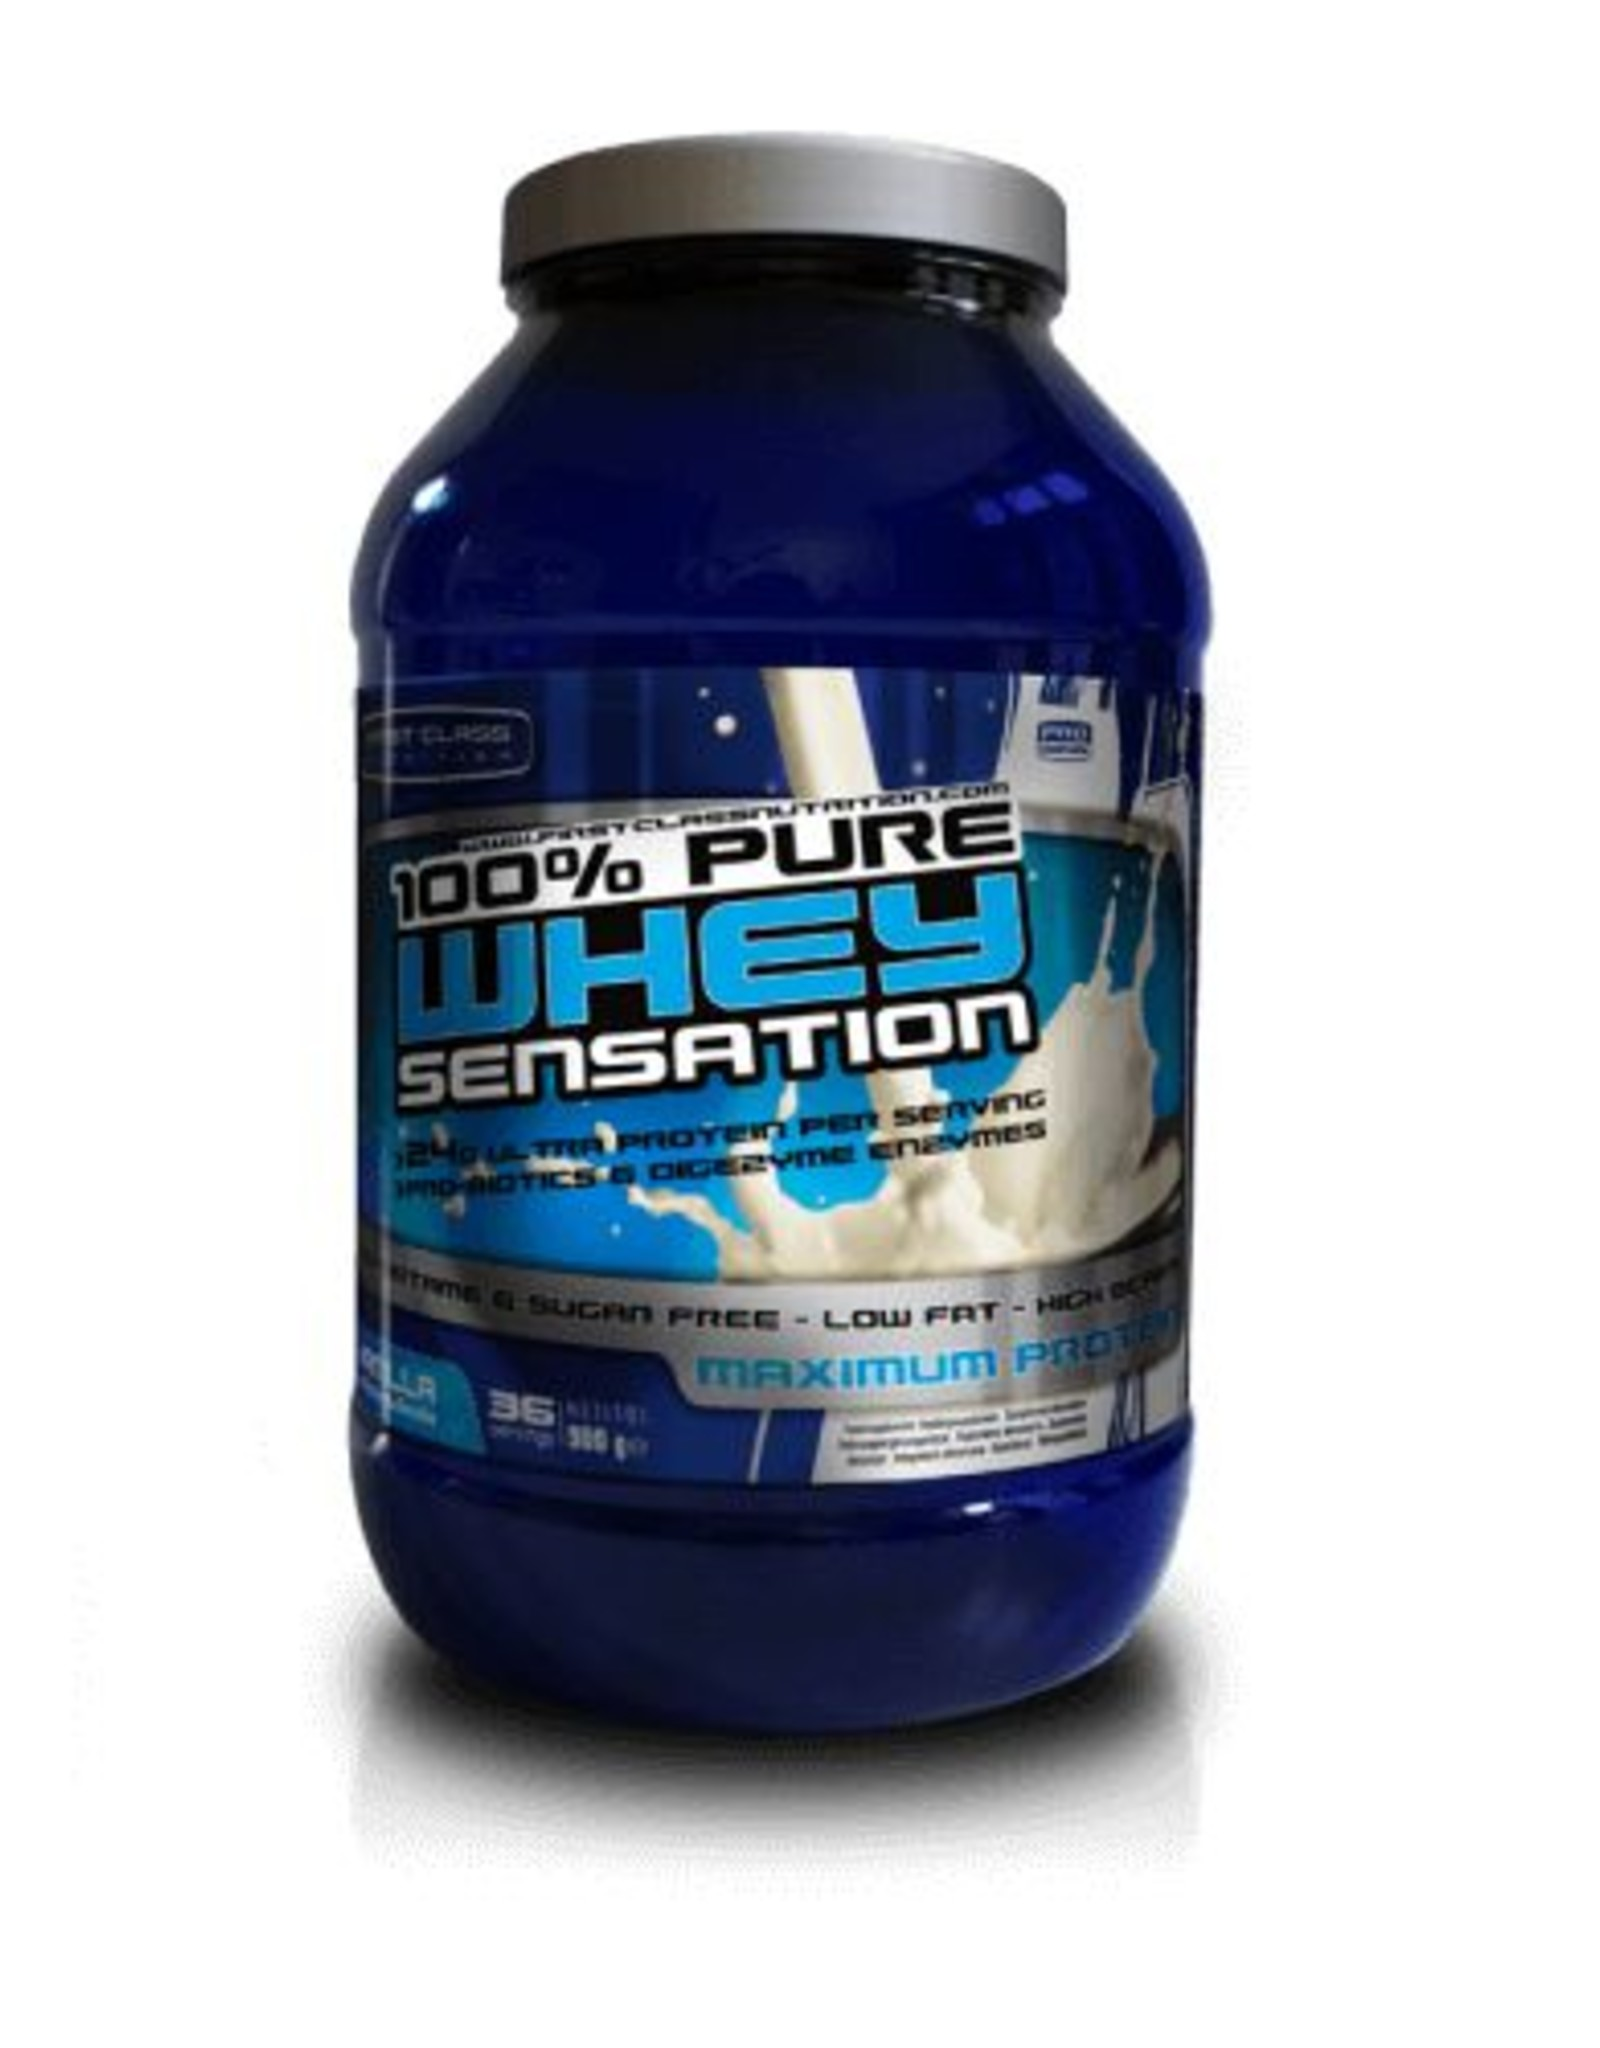 First class nutrition Whey sensation vanilla